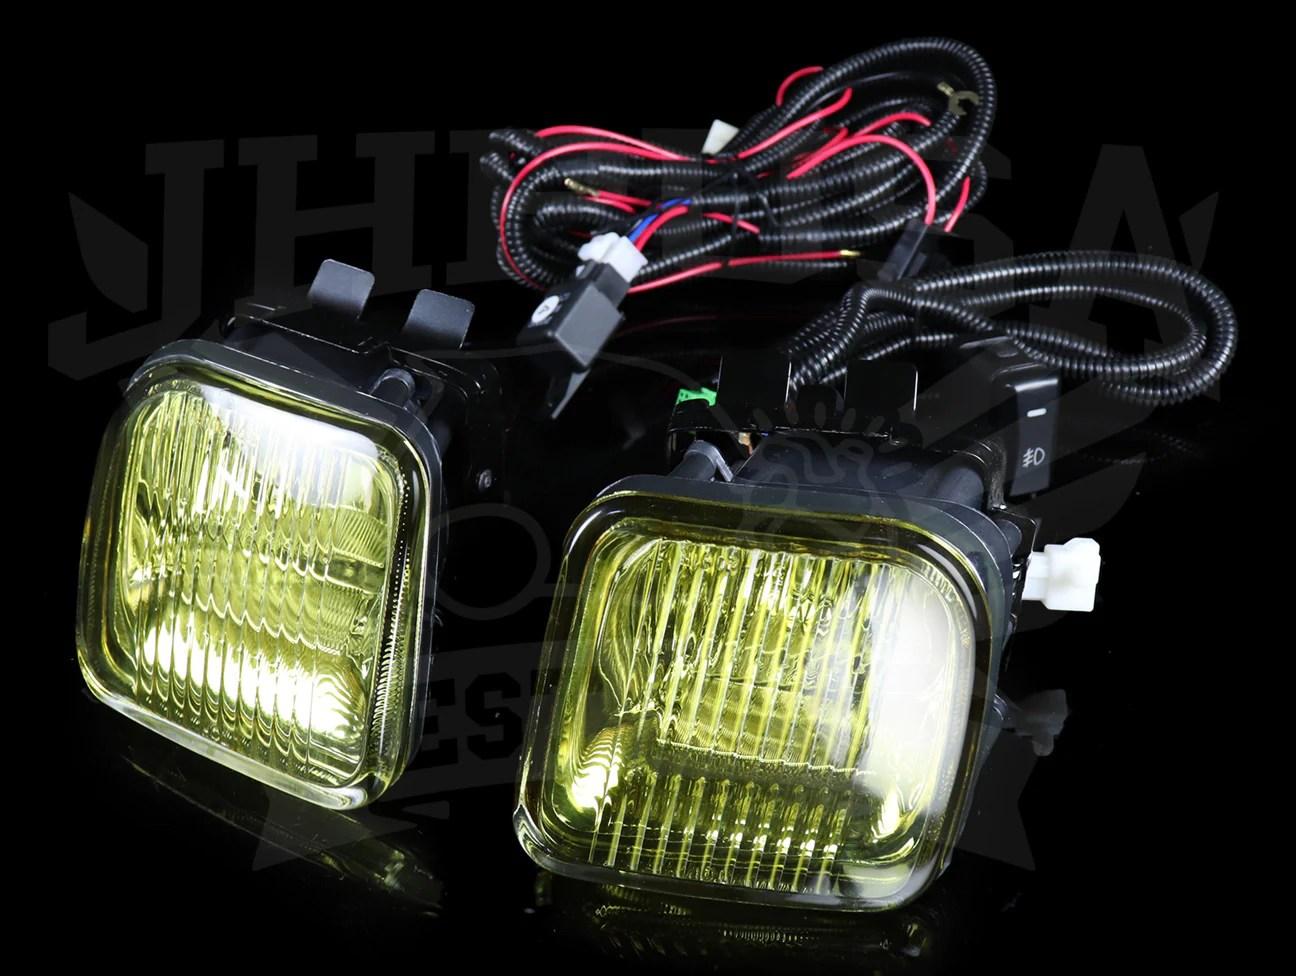 medium resolution of spec d tuning oem style yellow fog light kit 96 98 civic